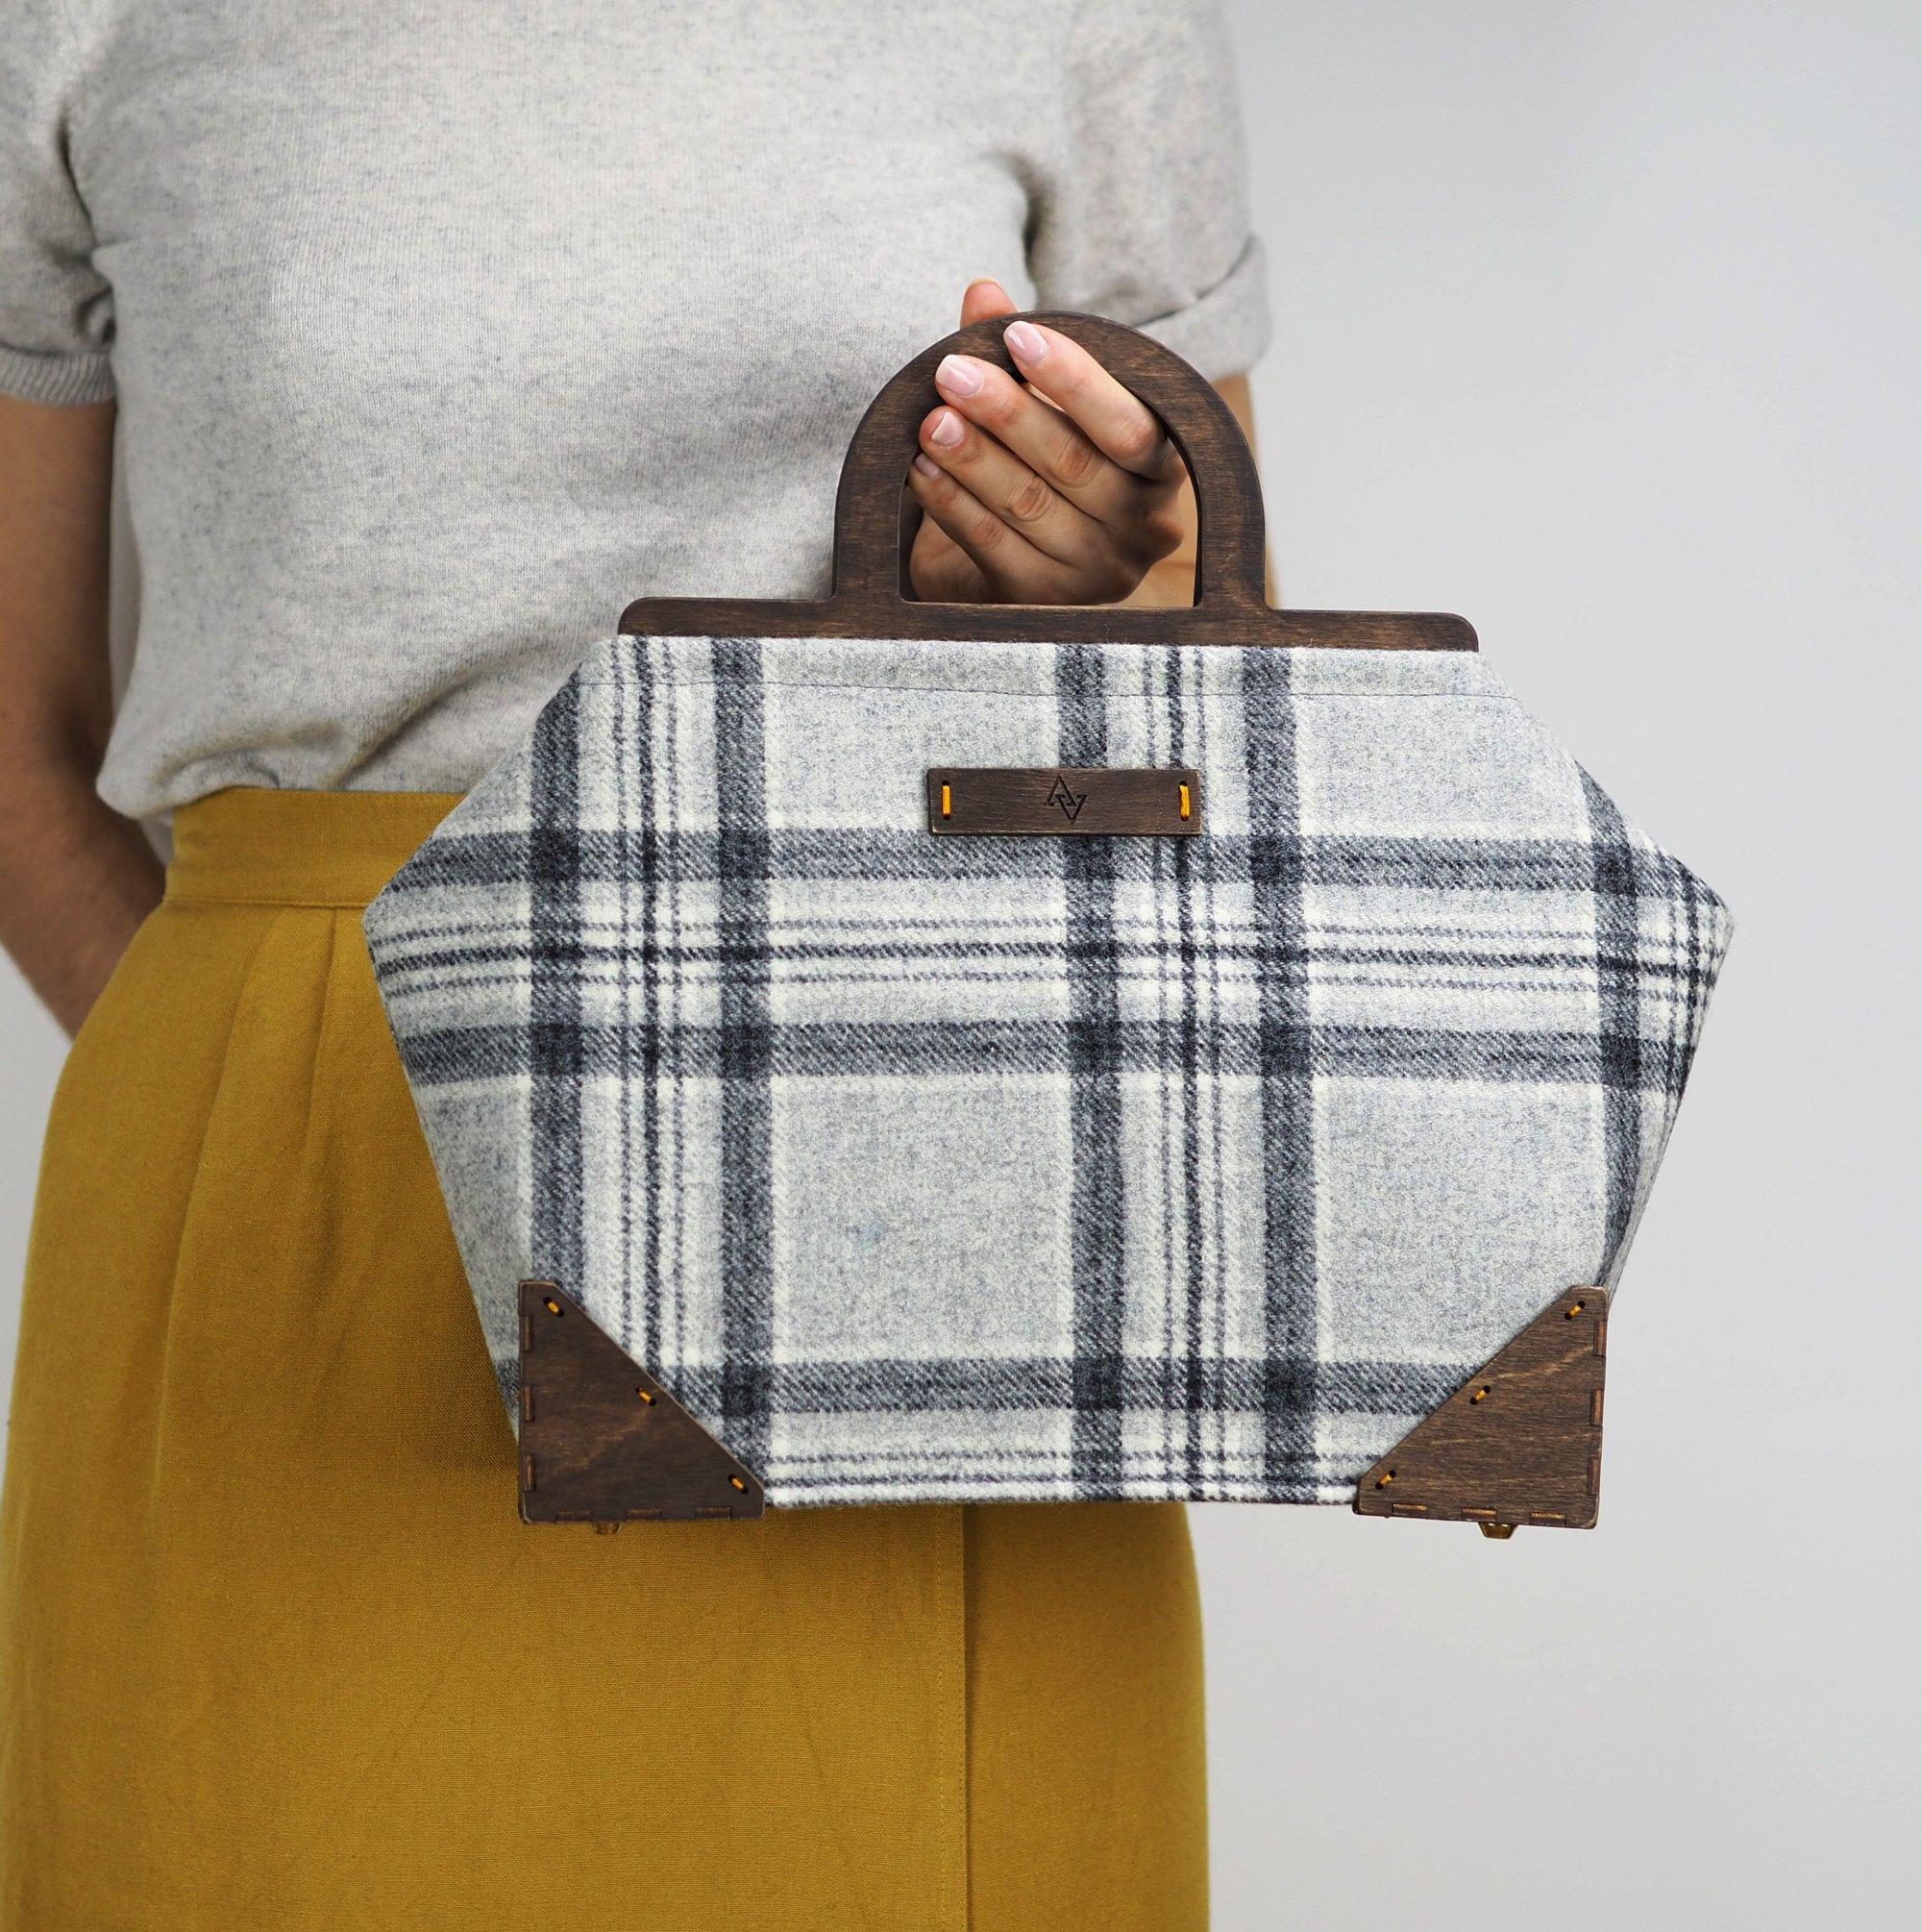 Framed Handbag in Aspen Wool Plaid - handmade-bags